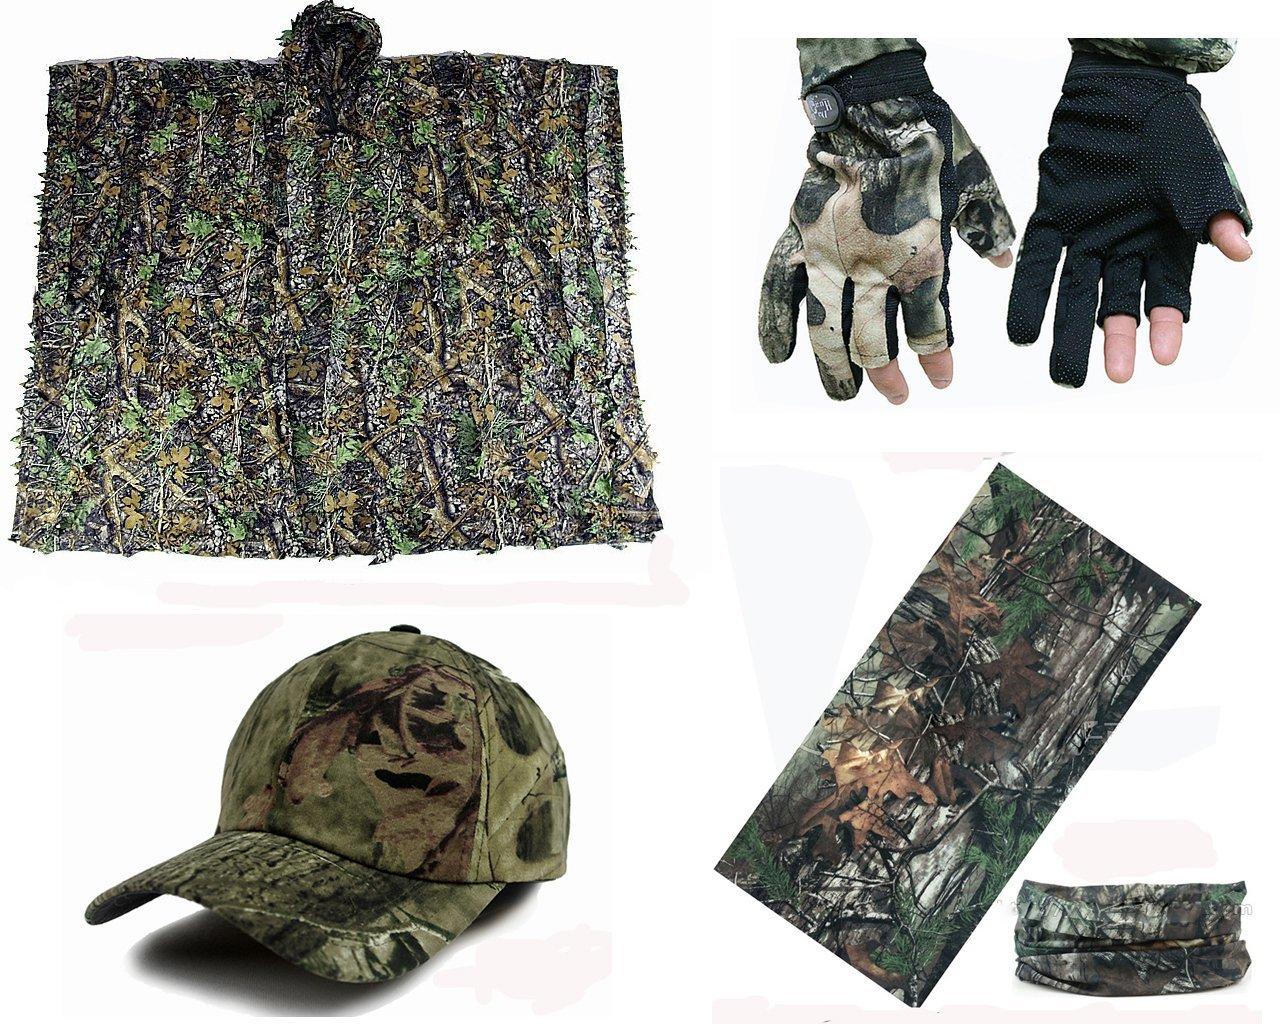 34b048785 Cheap Camo Sniper Suit